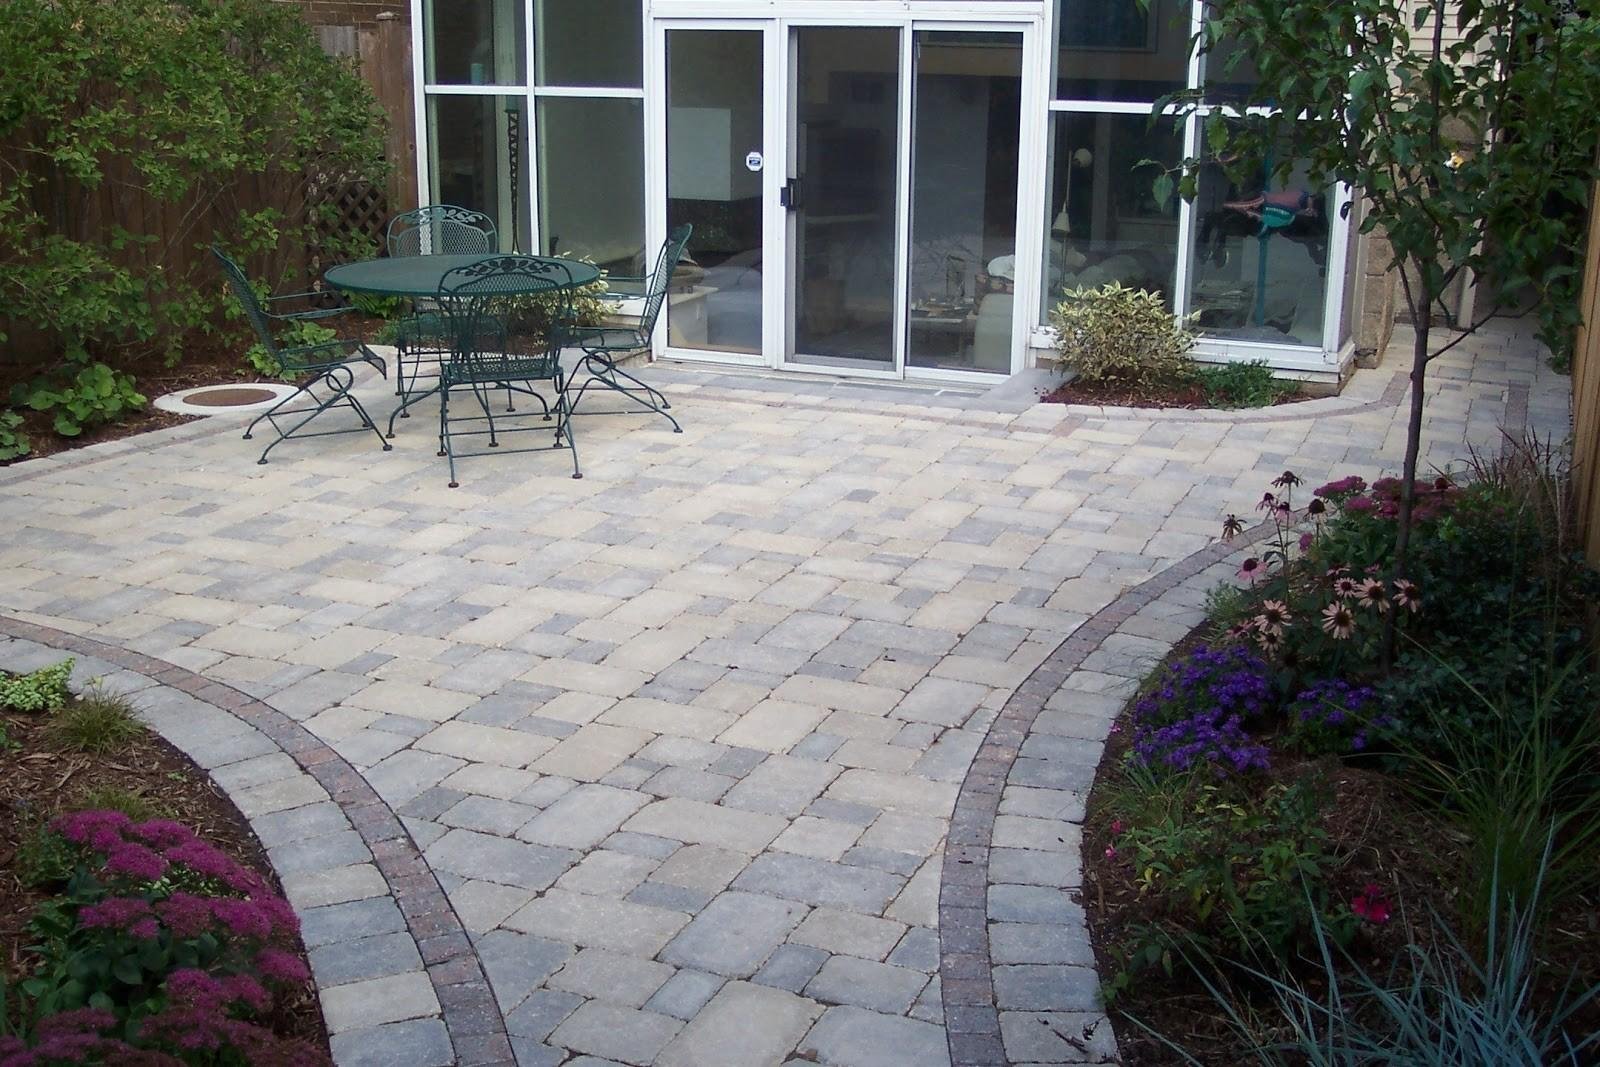 47 beautiful brick patio designs that